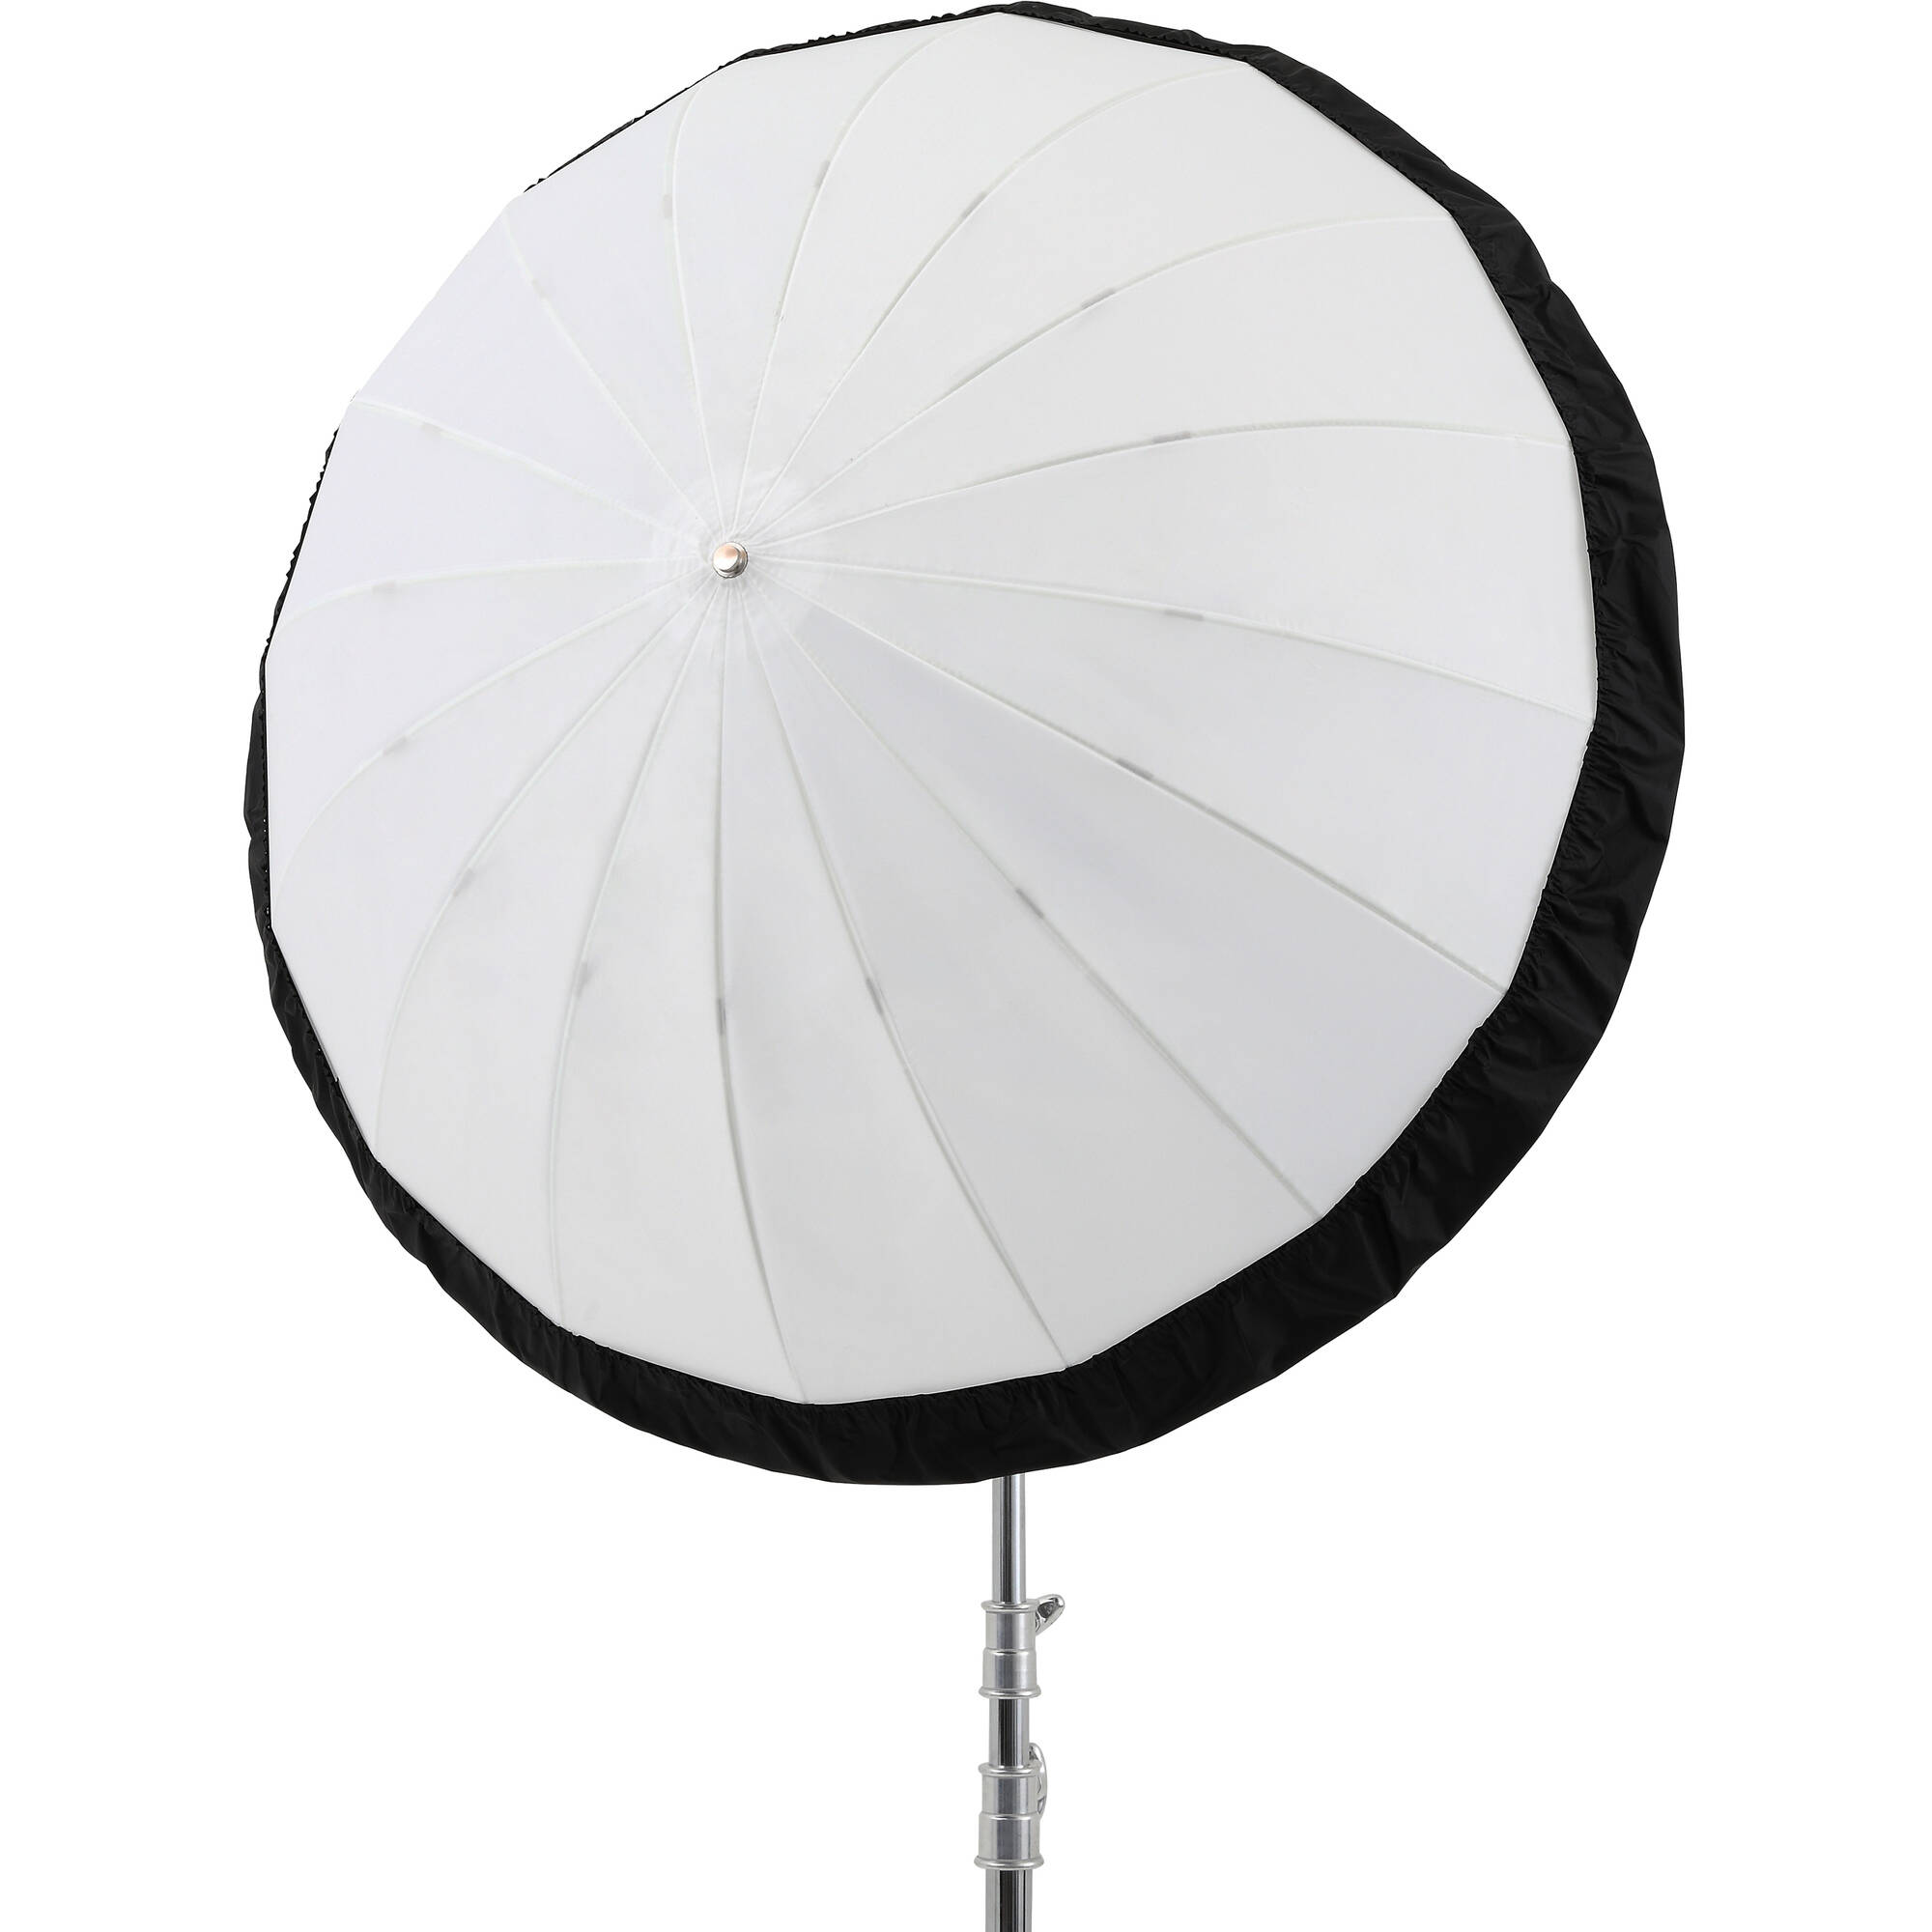 GODOX Diffuser for 33.5 Parabolic Umbrella